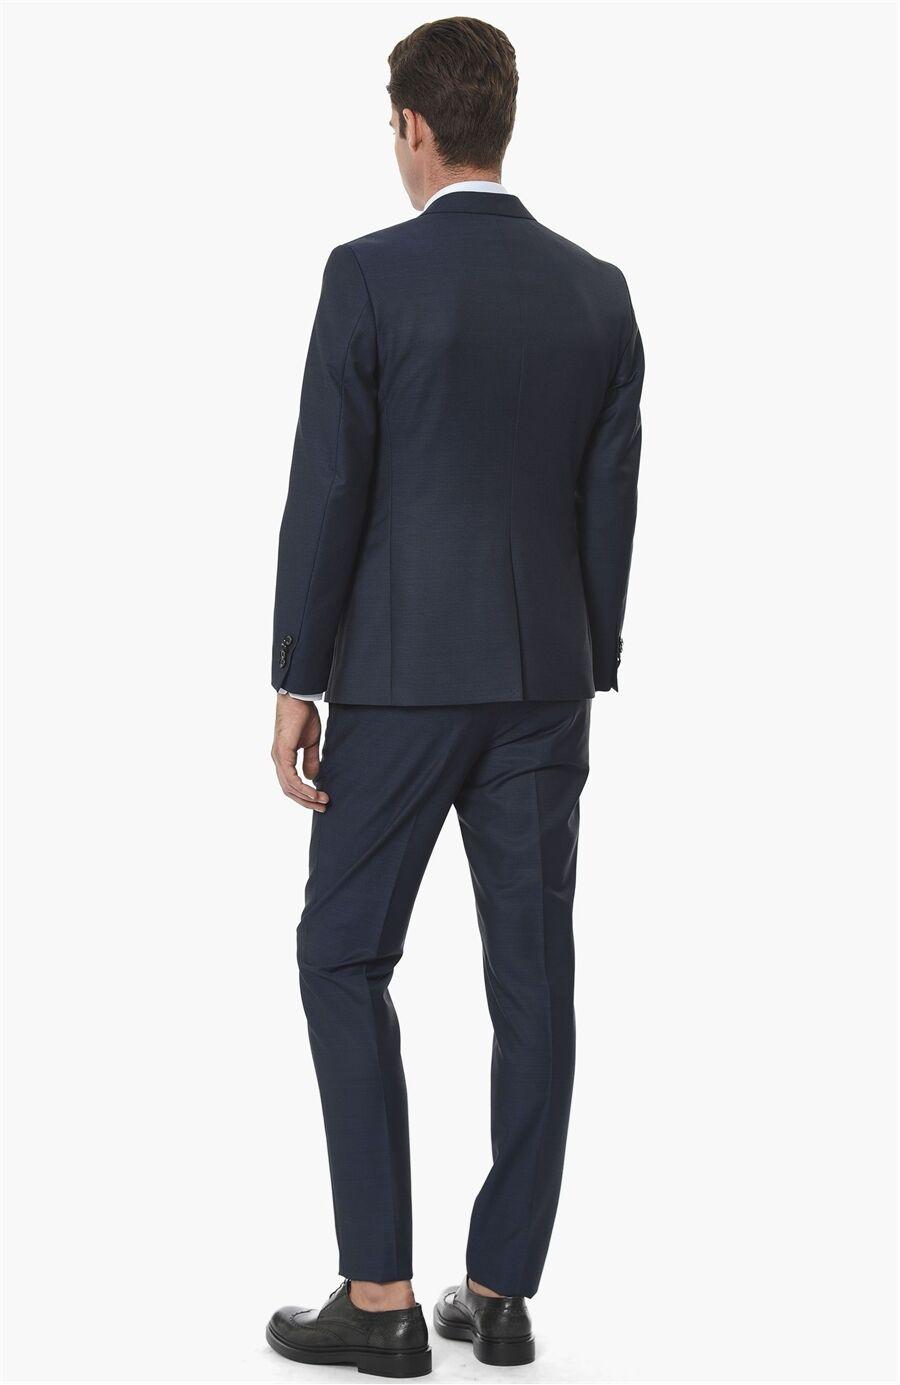 Mikro Slım Fit Saks Yeleklı Takım Elbise